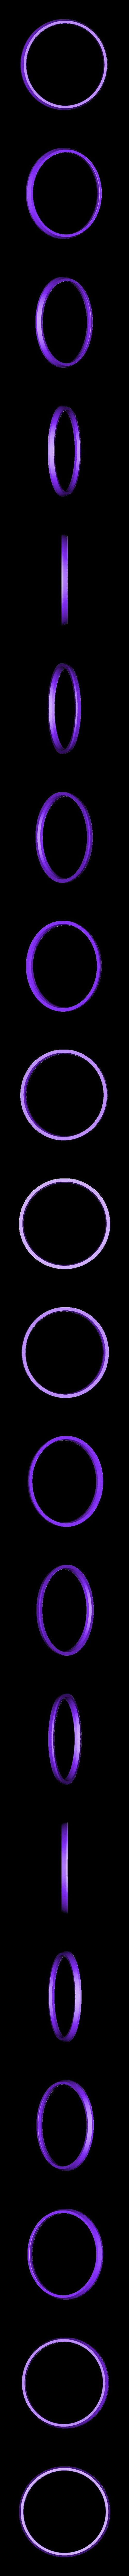 lens_ring.stl Download free STL file Oculus Rift DK2 • 3D printing object, indigo4